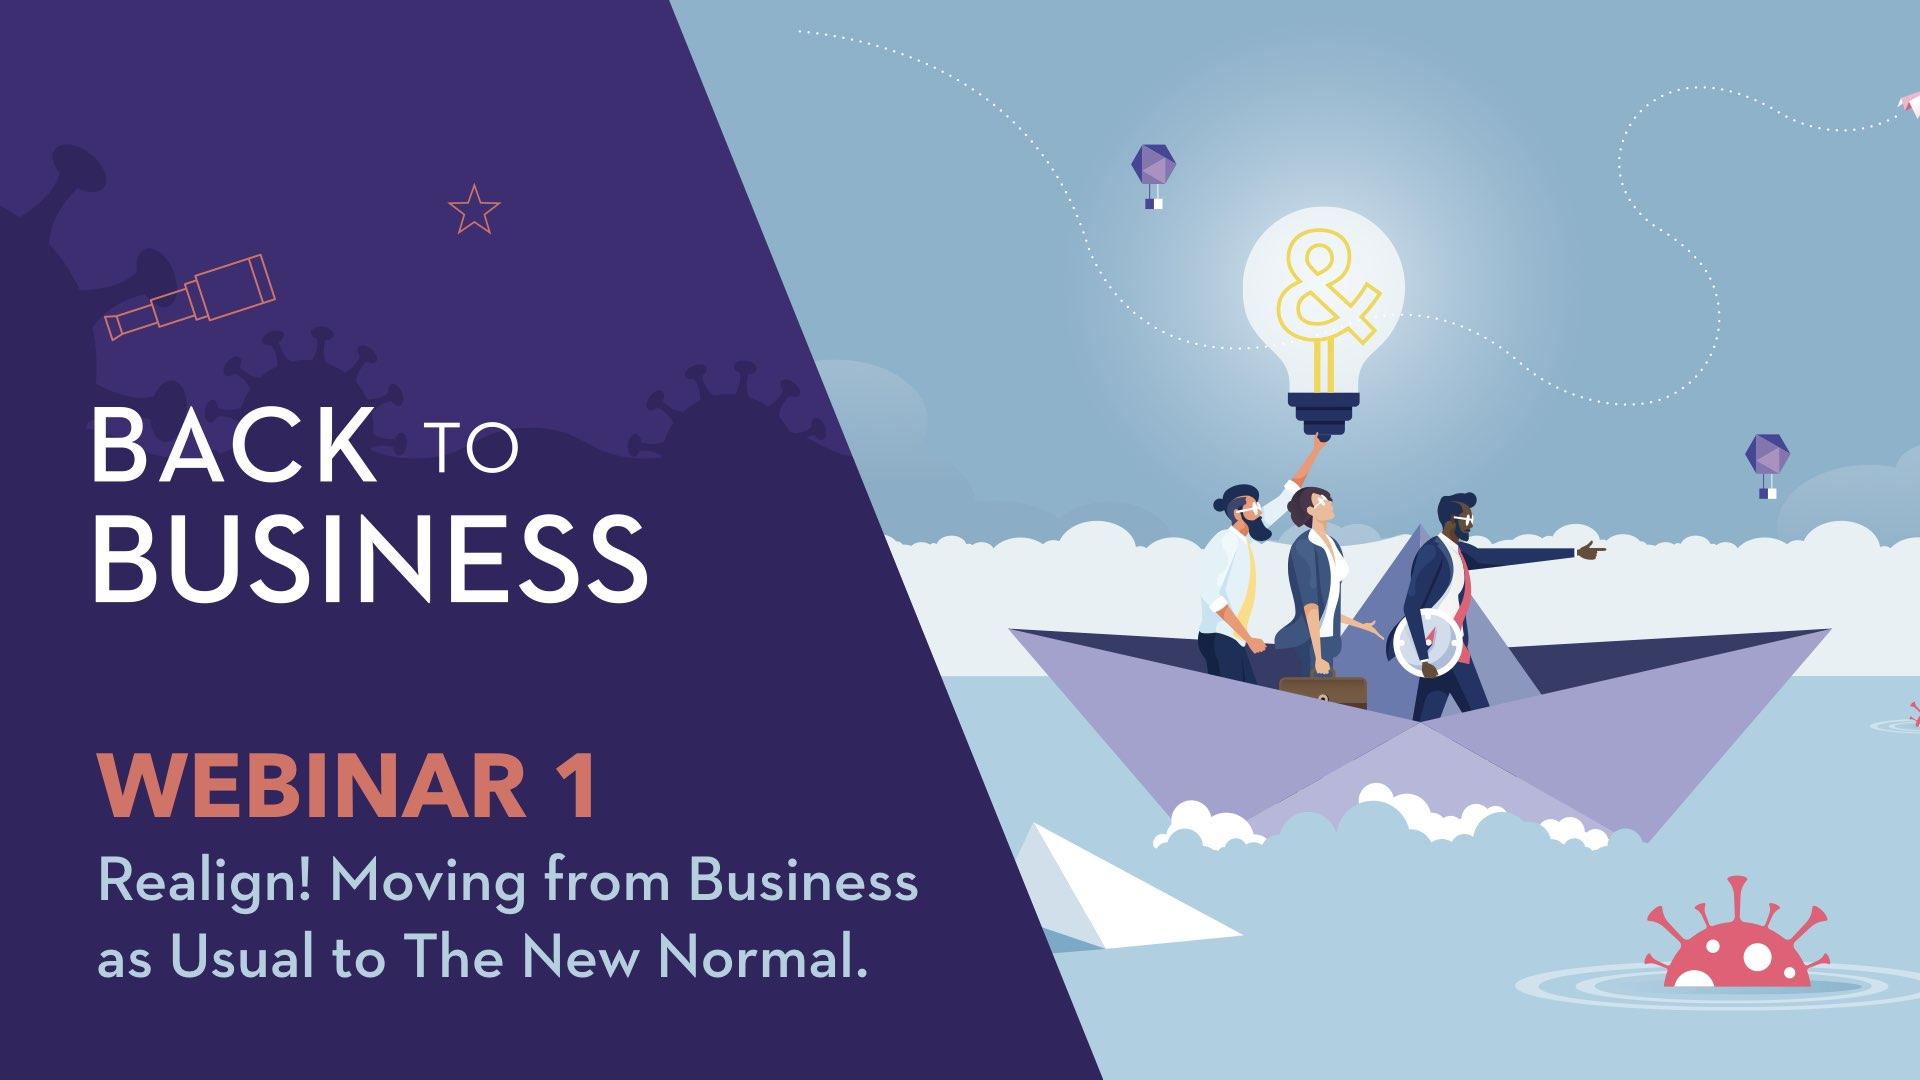 Back To Business Webinar 1